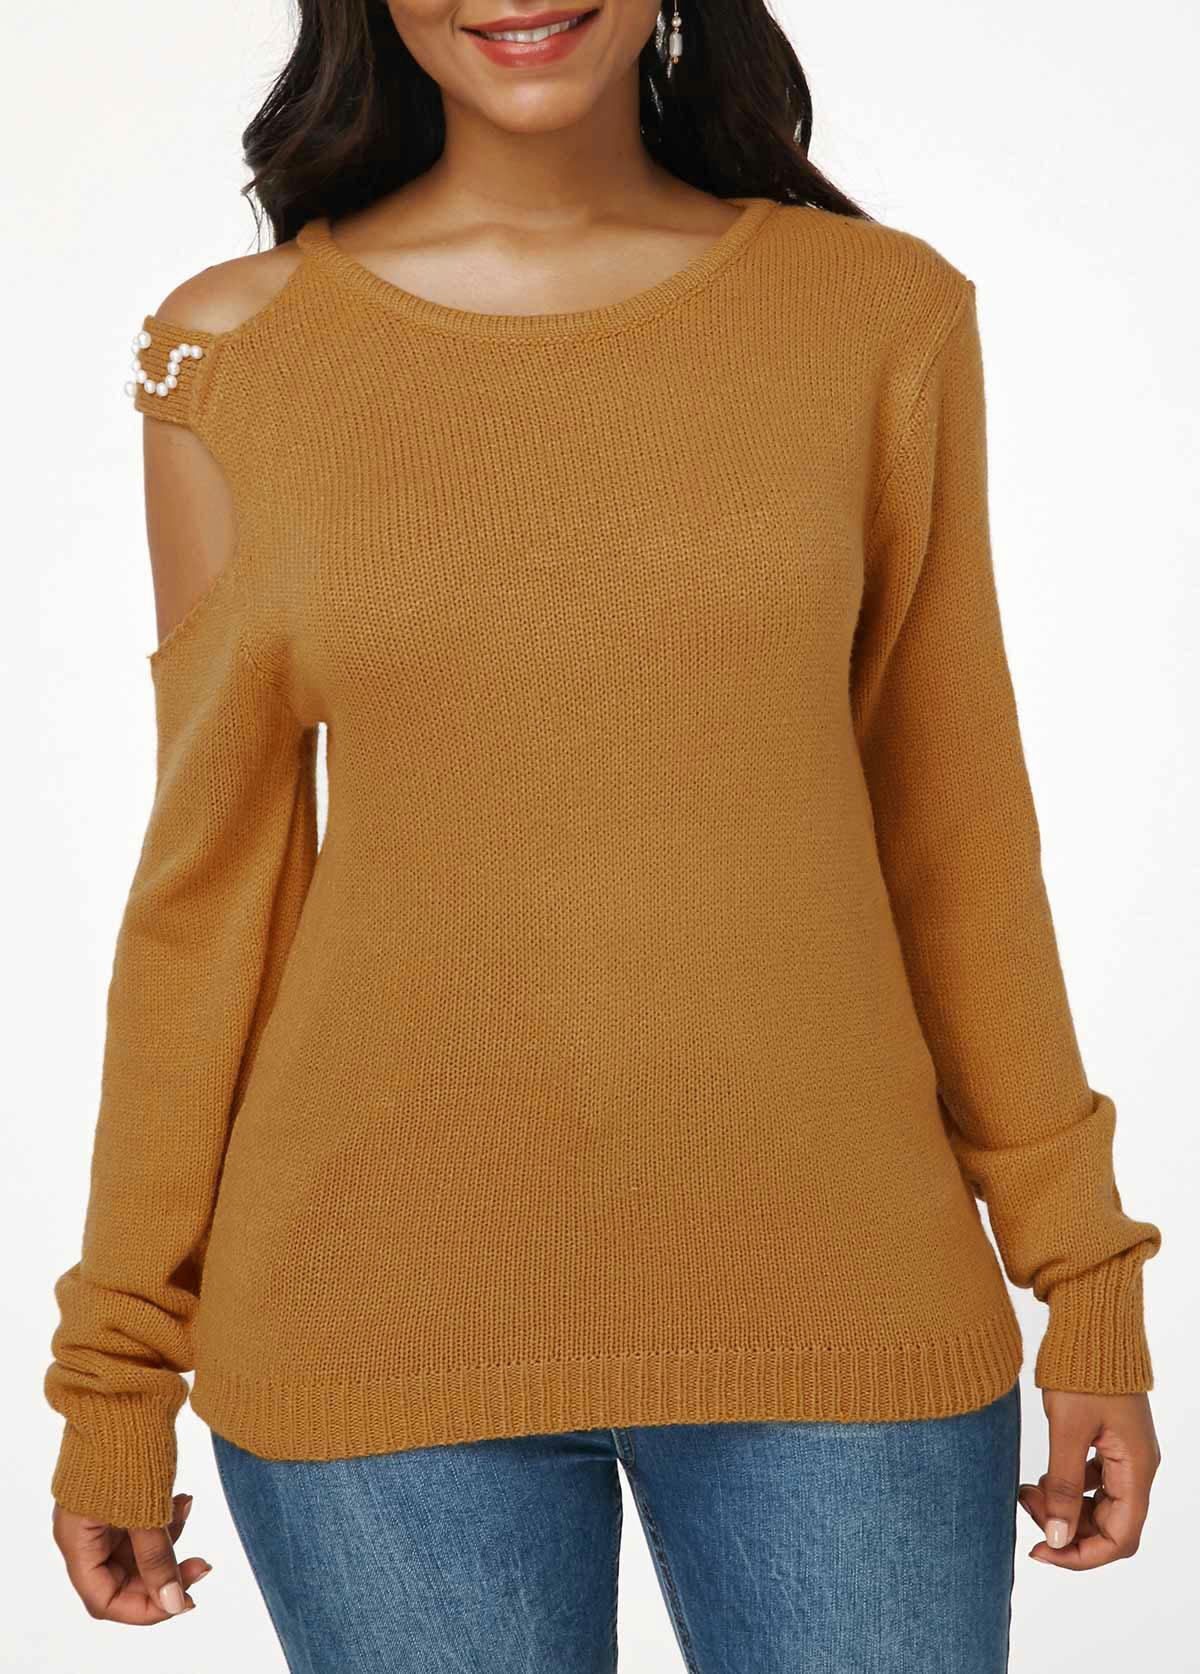 ROTITA Ginger Faux Pearl Embellished Cutout Shoulder Knitting Sweater